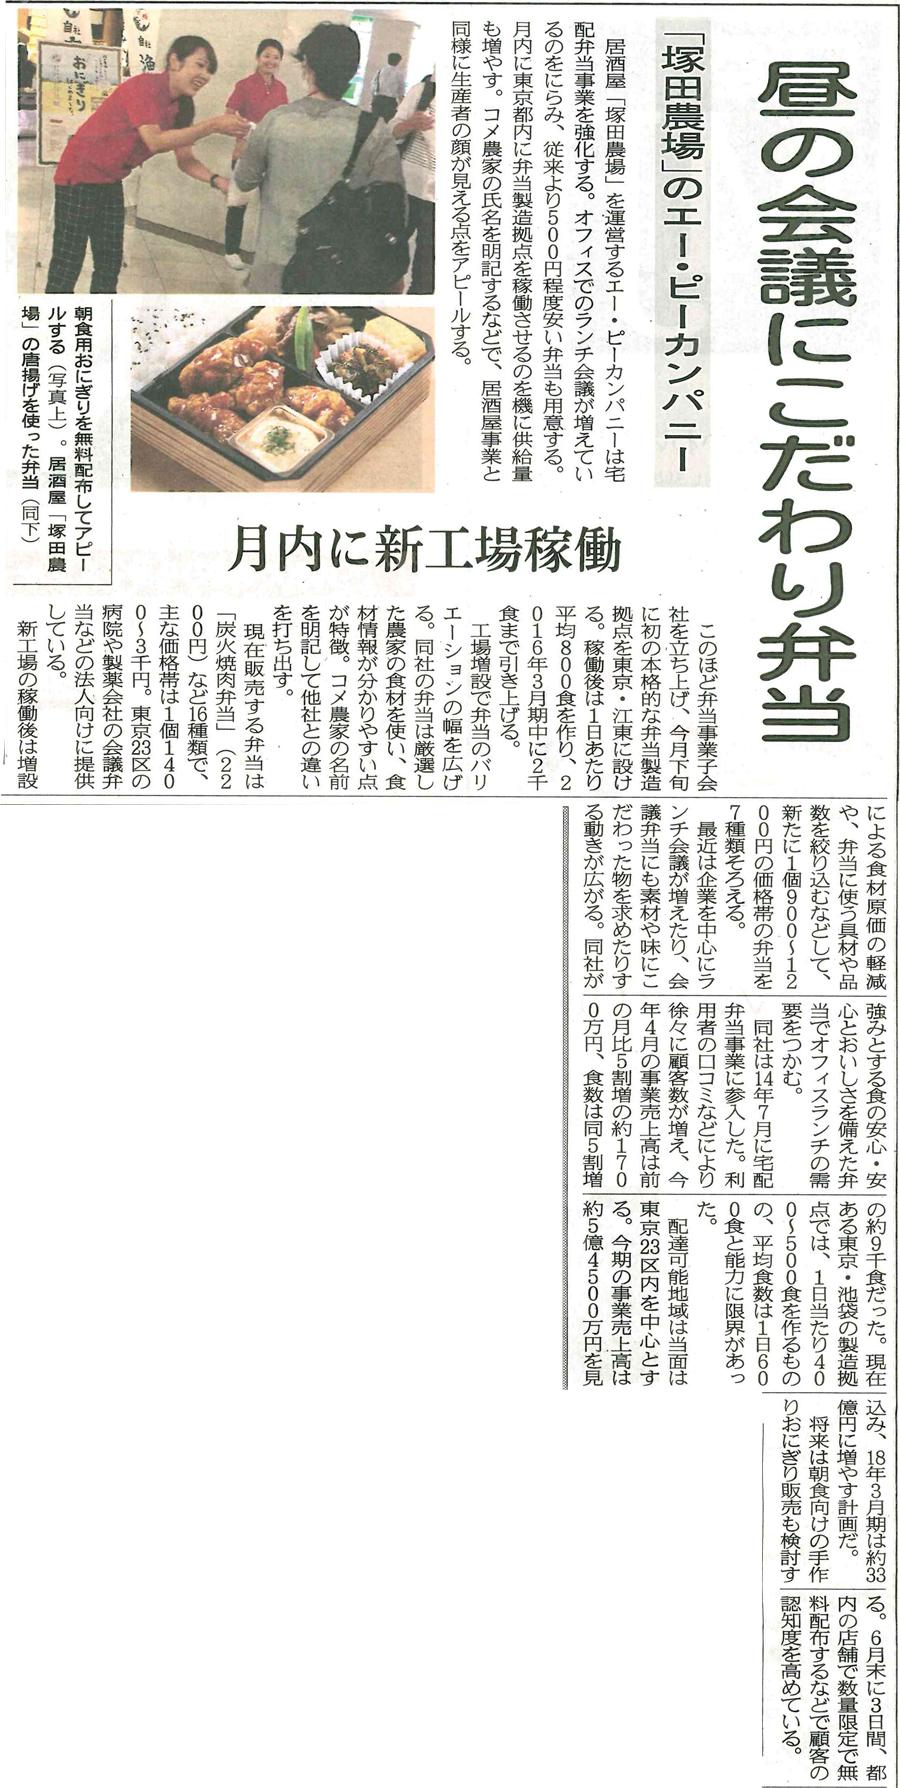 http://www.apcompany.jp/media/%E6%97%A5%E7%B5%8CMJ2015_07_08.jpg